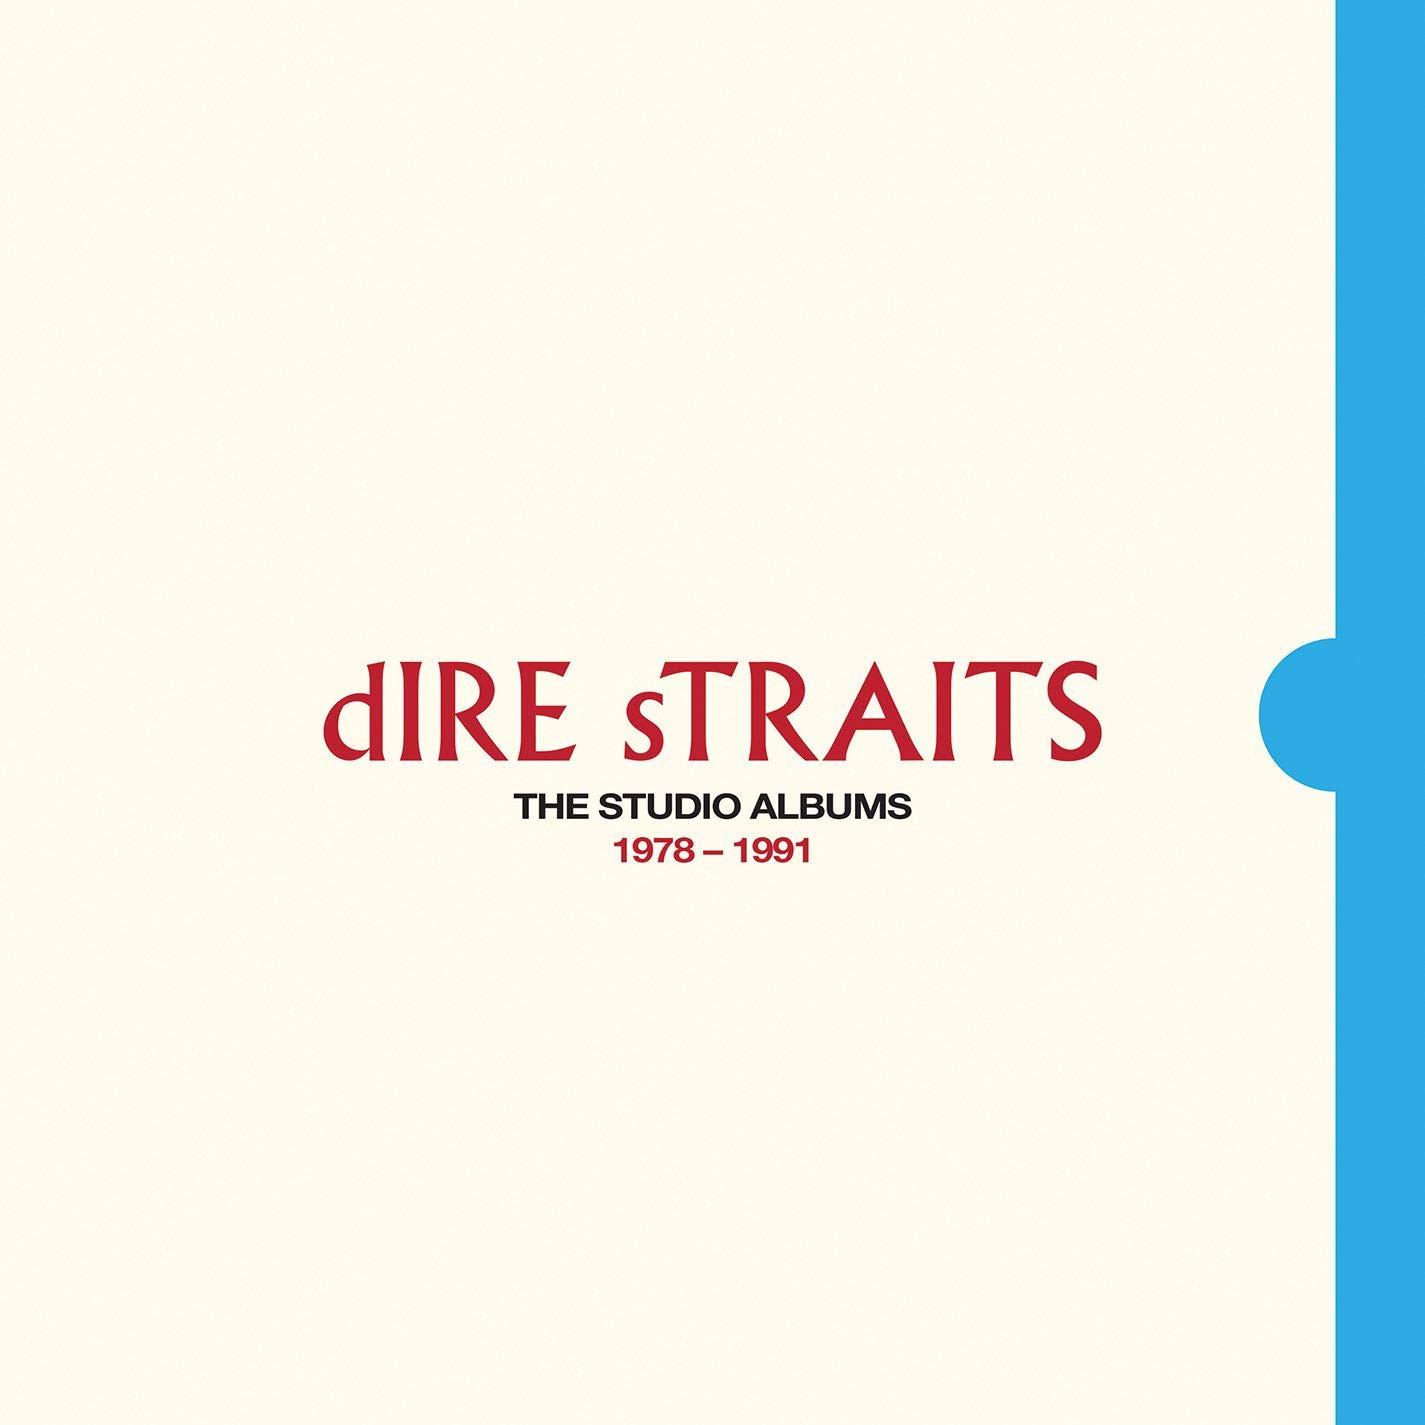 Dire Straits - The Studio Albums 1978-1991 (2020) [FLAC] Download